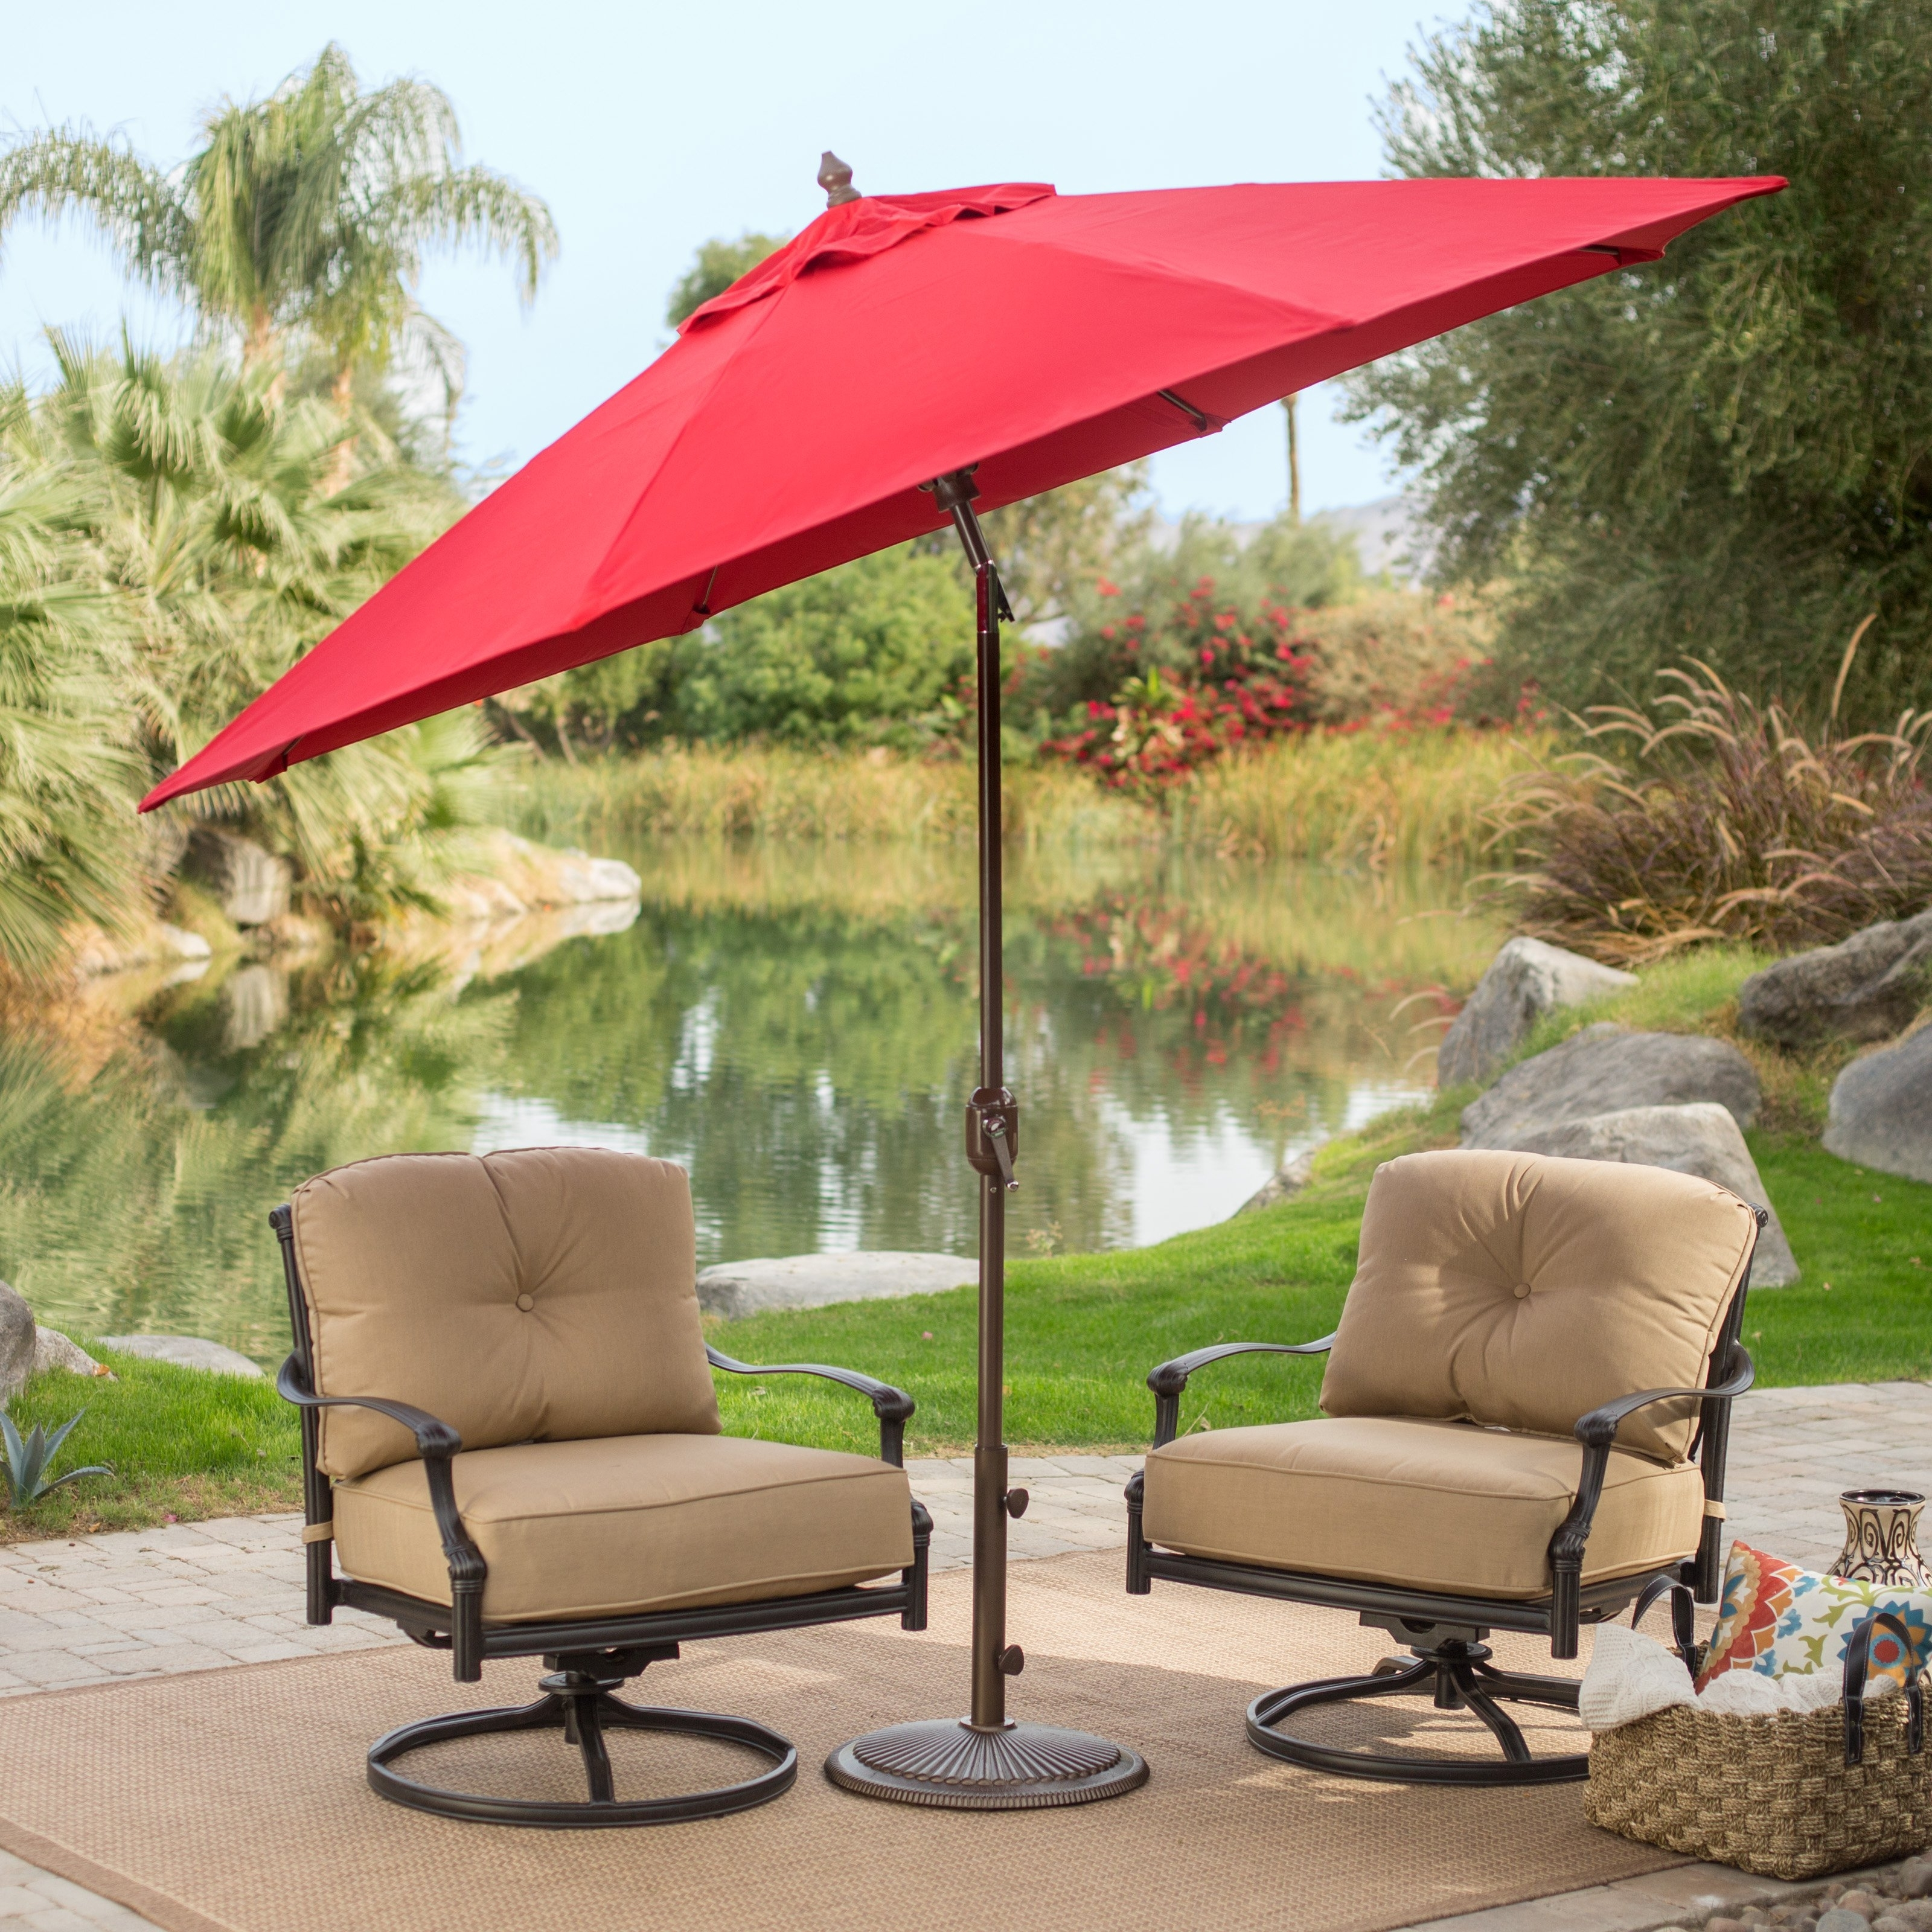 Deluxe Patio Umbrellas Regarding Recent Coral Coast 9 Ft. Sunbrella Deluxe Tilt Aluminum Patio Umbrella (Gallery 1 of 20)